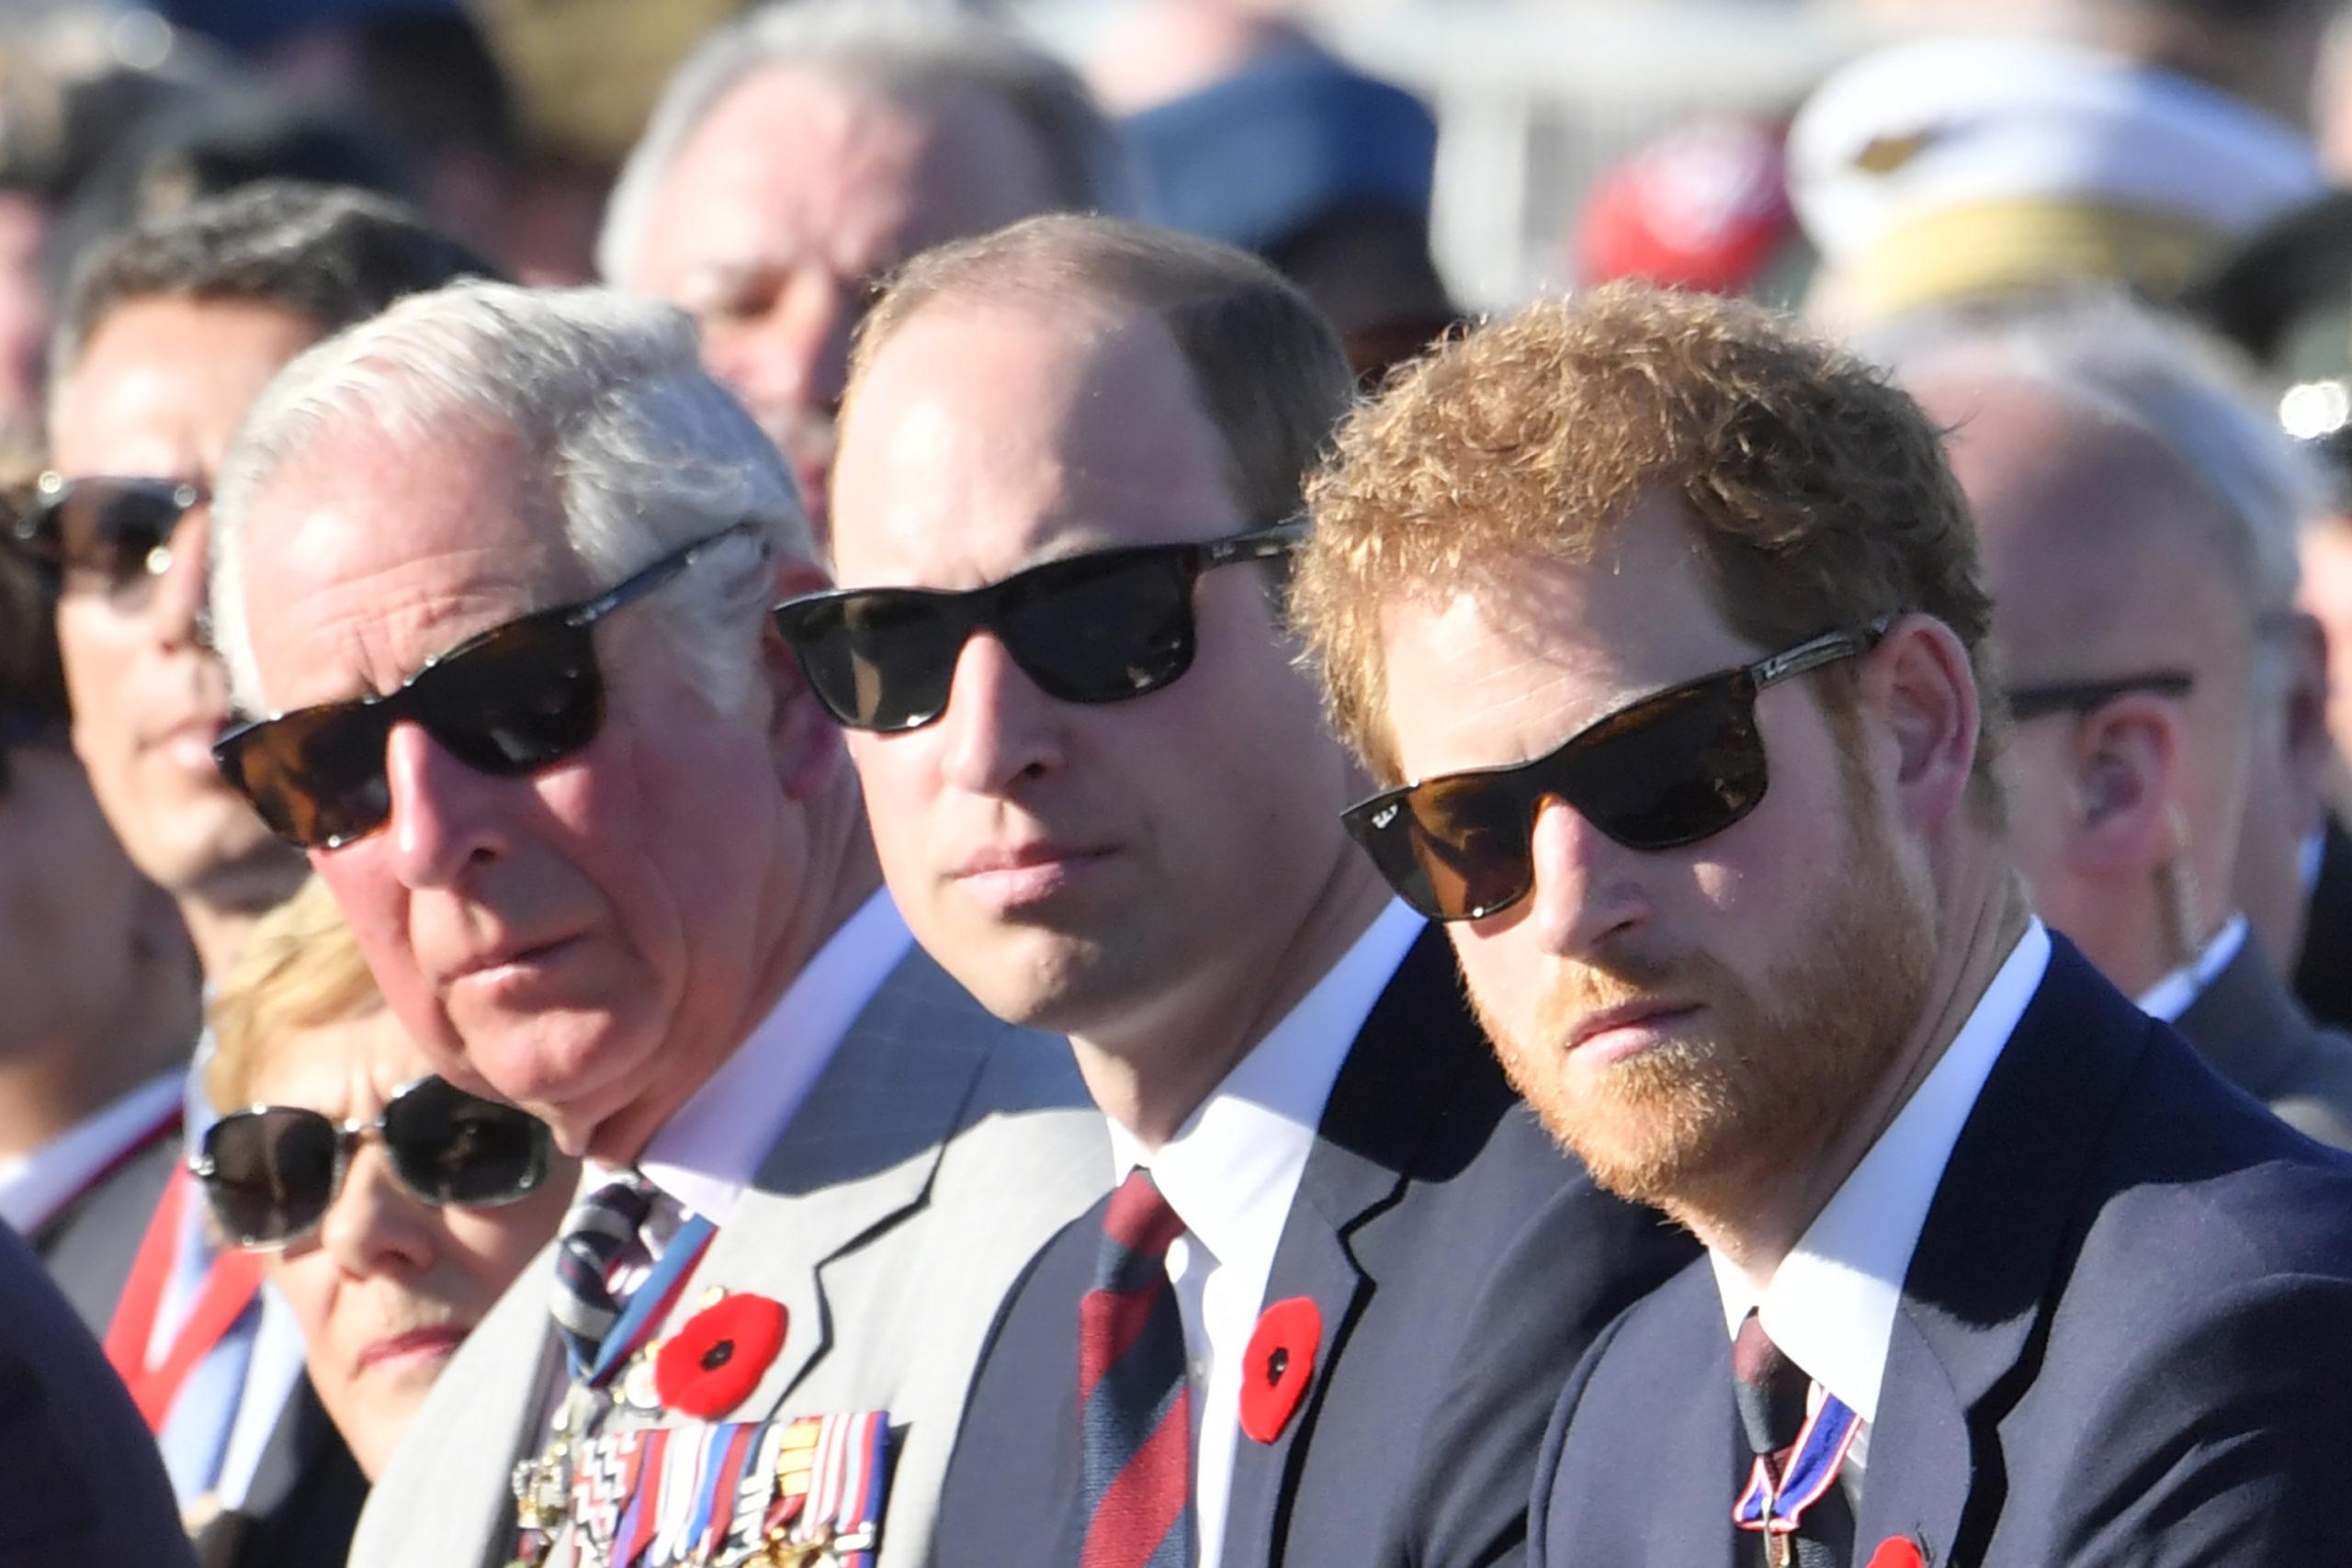 Prince Charles, Prince William and Prince Harry